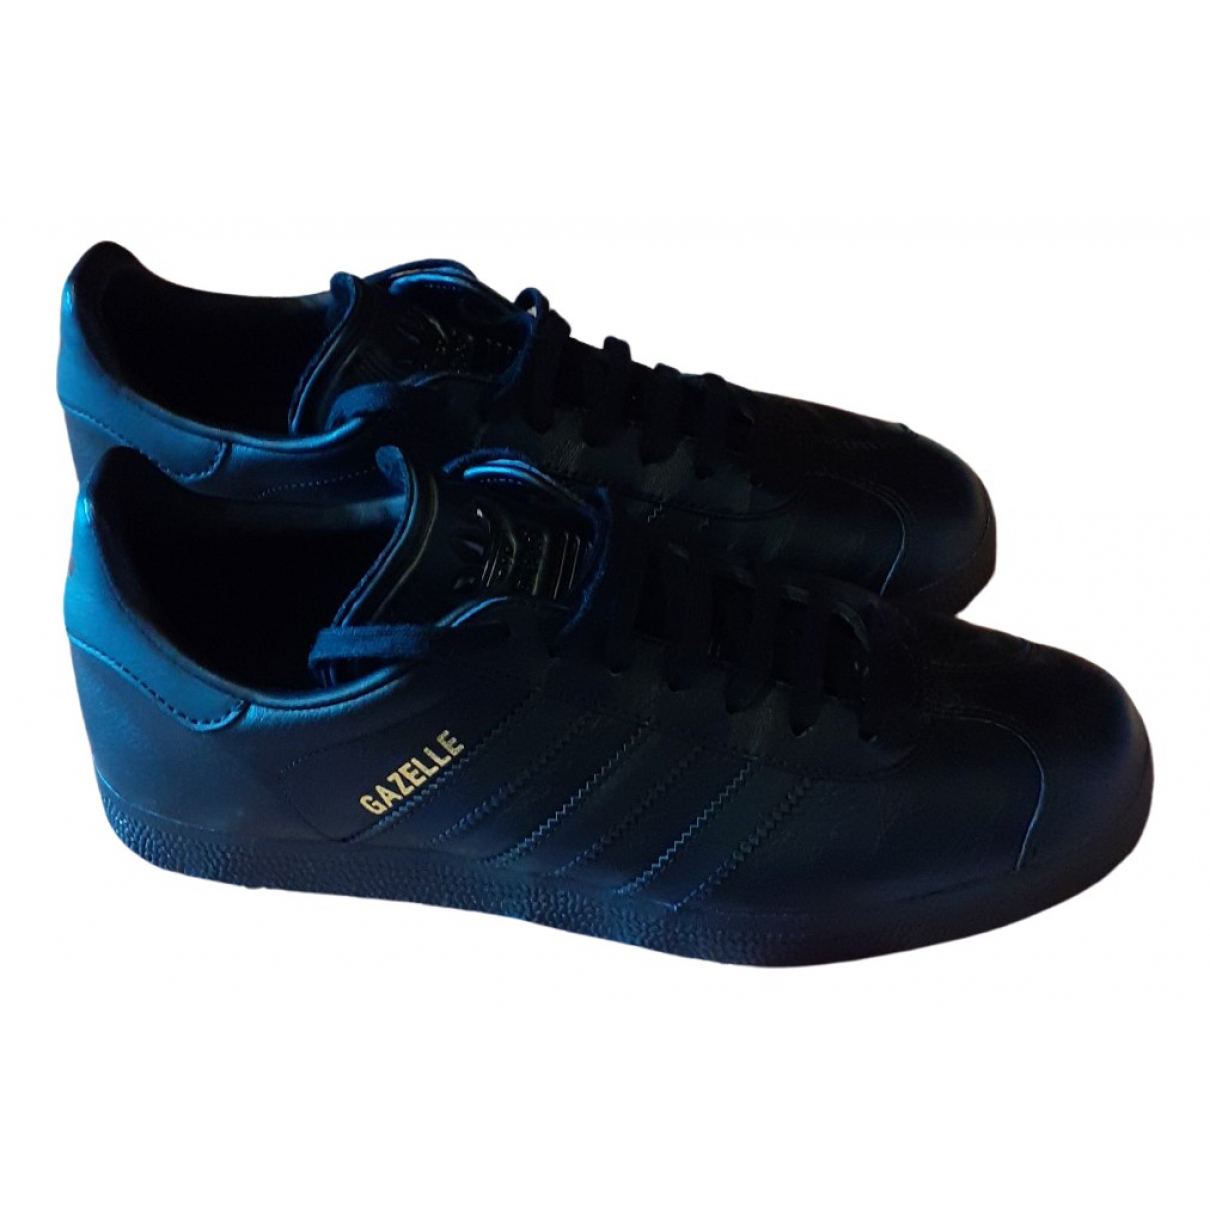 Adidas Gazelle Black Leather Trainers for Men 40 EU